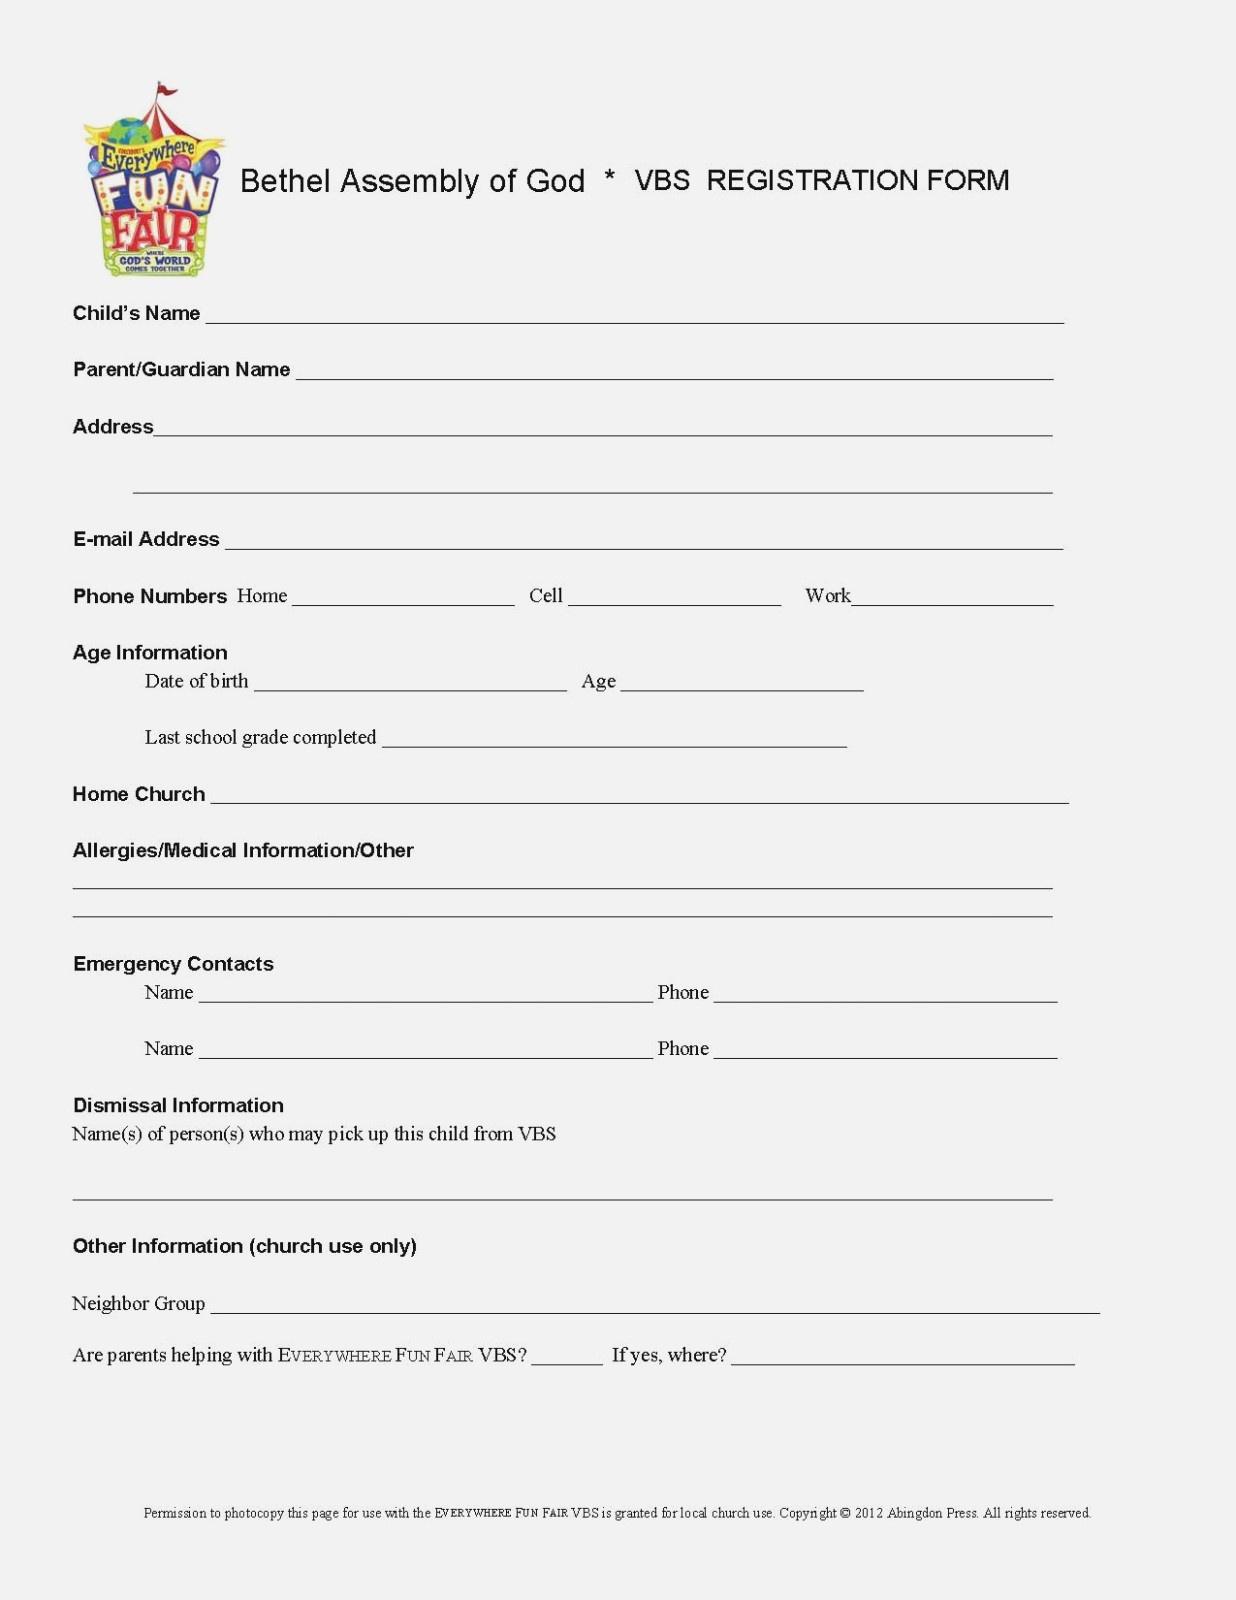 Registration Form For Vbs – Heart.impulsar – Form Information - Free Printable Vbs Registration Forms